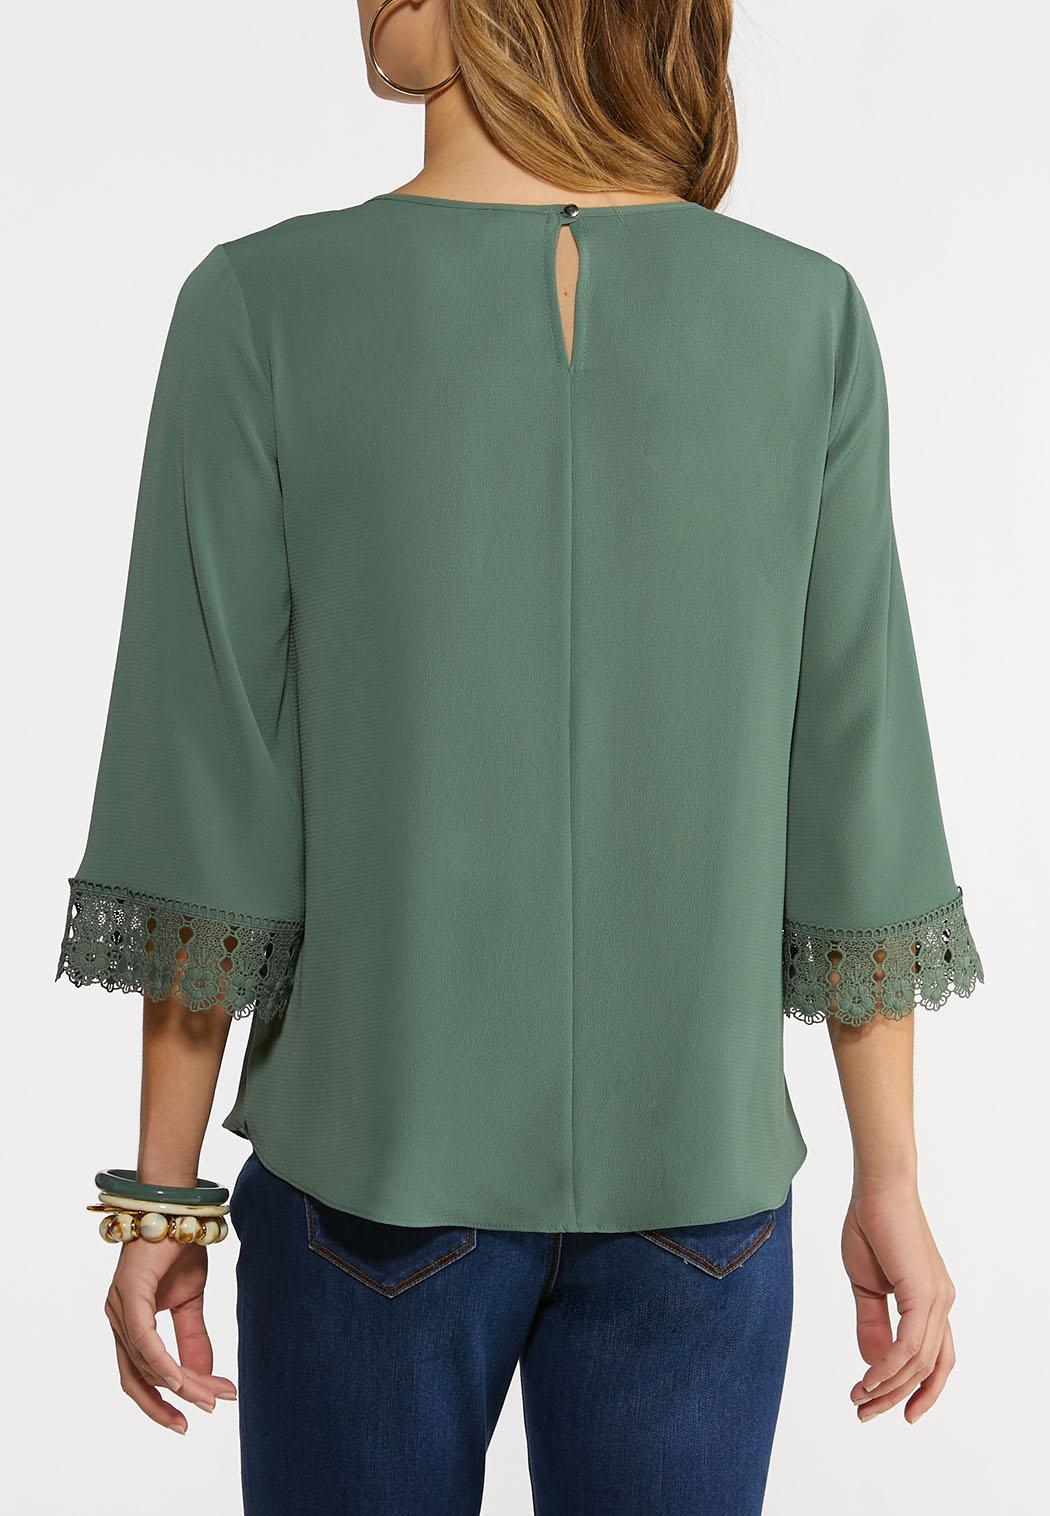 Plus Size Criss Cross Lace Sleeve Top (Item #44201120)